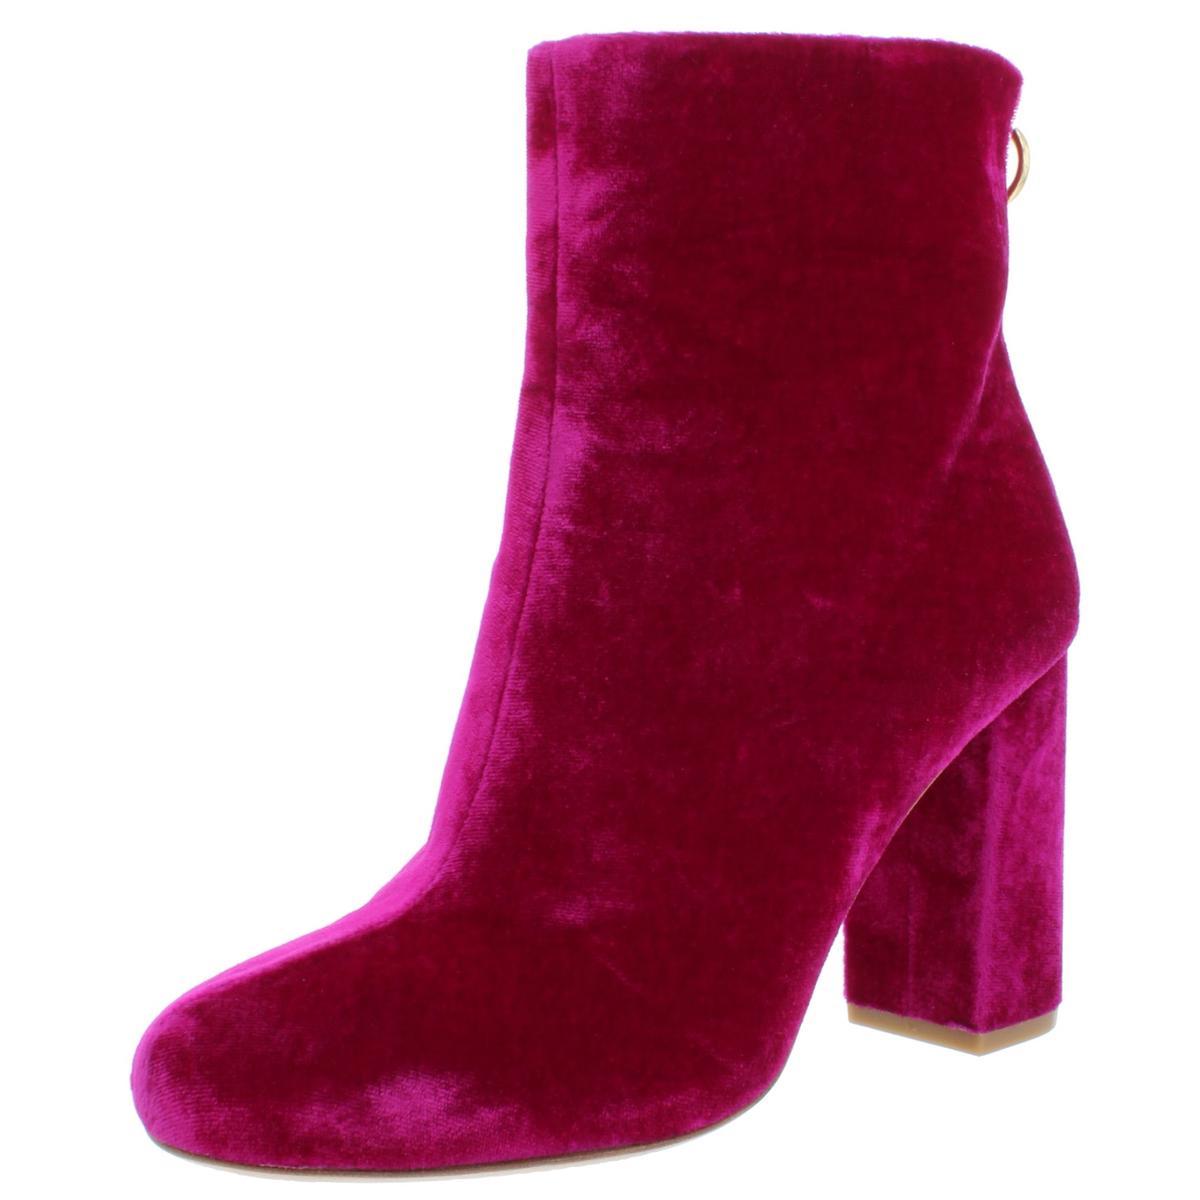 BHFO 7543 Joie Womens Saleema Ivory Leather Booties Shoes 41 Medium B,M